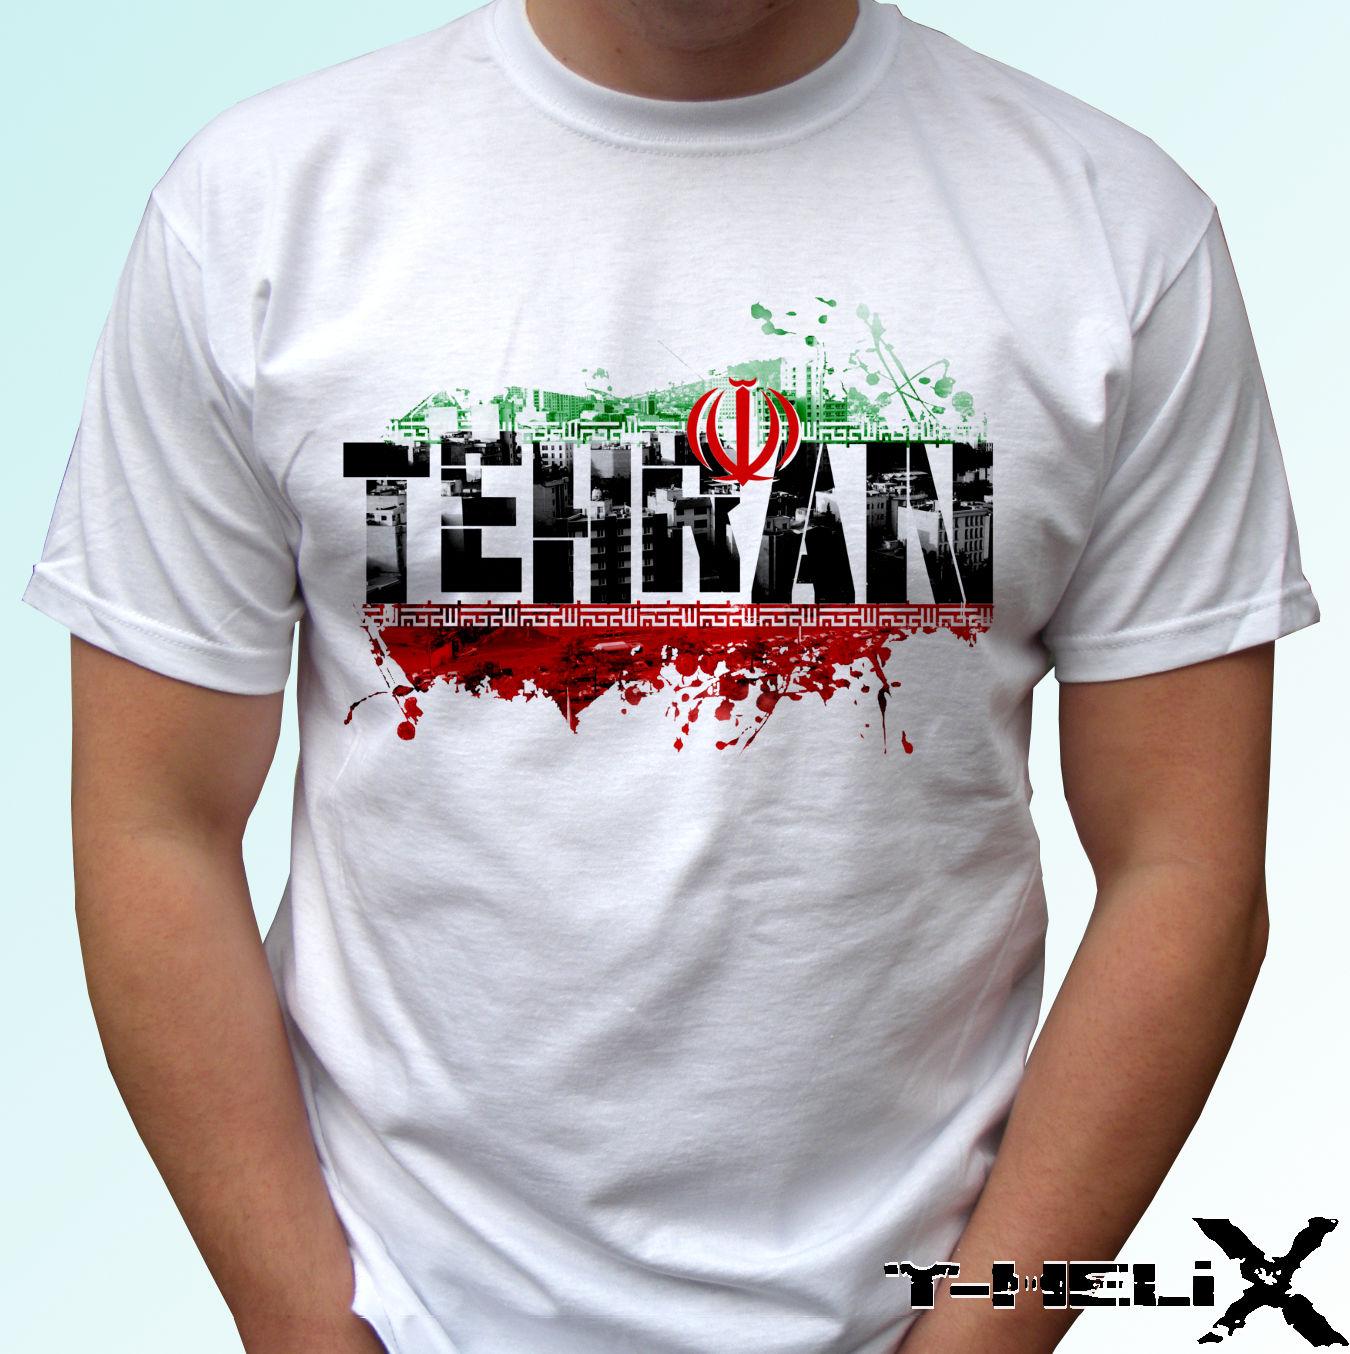 bddcbc3c2a17 2019 Fashion Round Neck Clothes Tehran Iran Flag - White T Shirt Top Tee  Design -